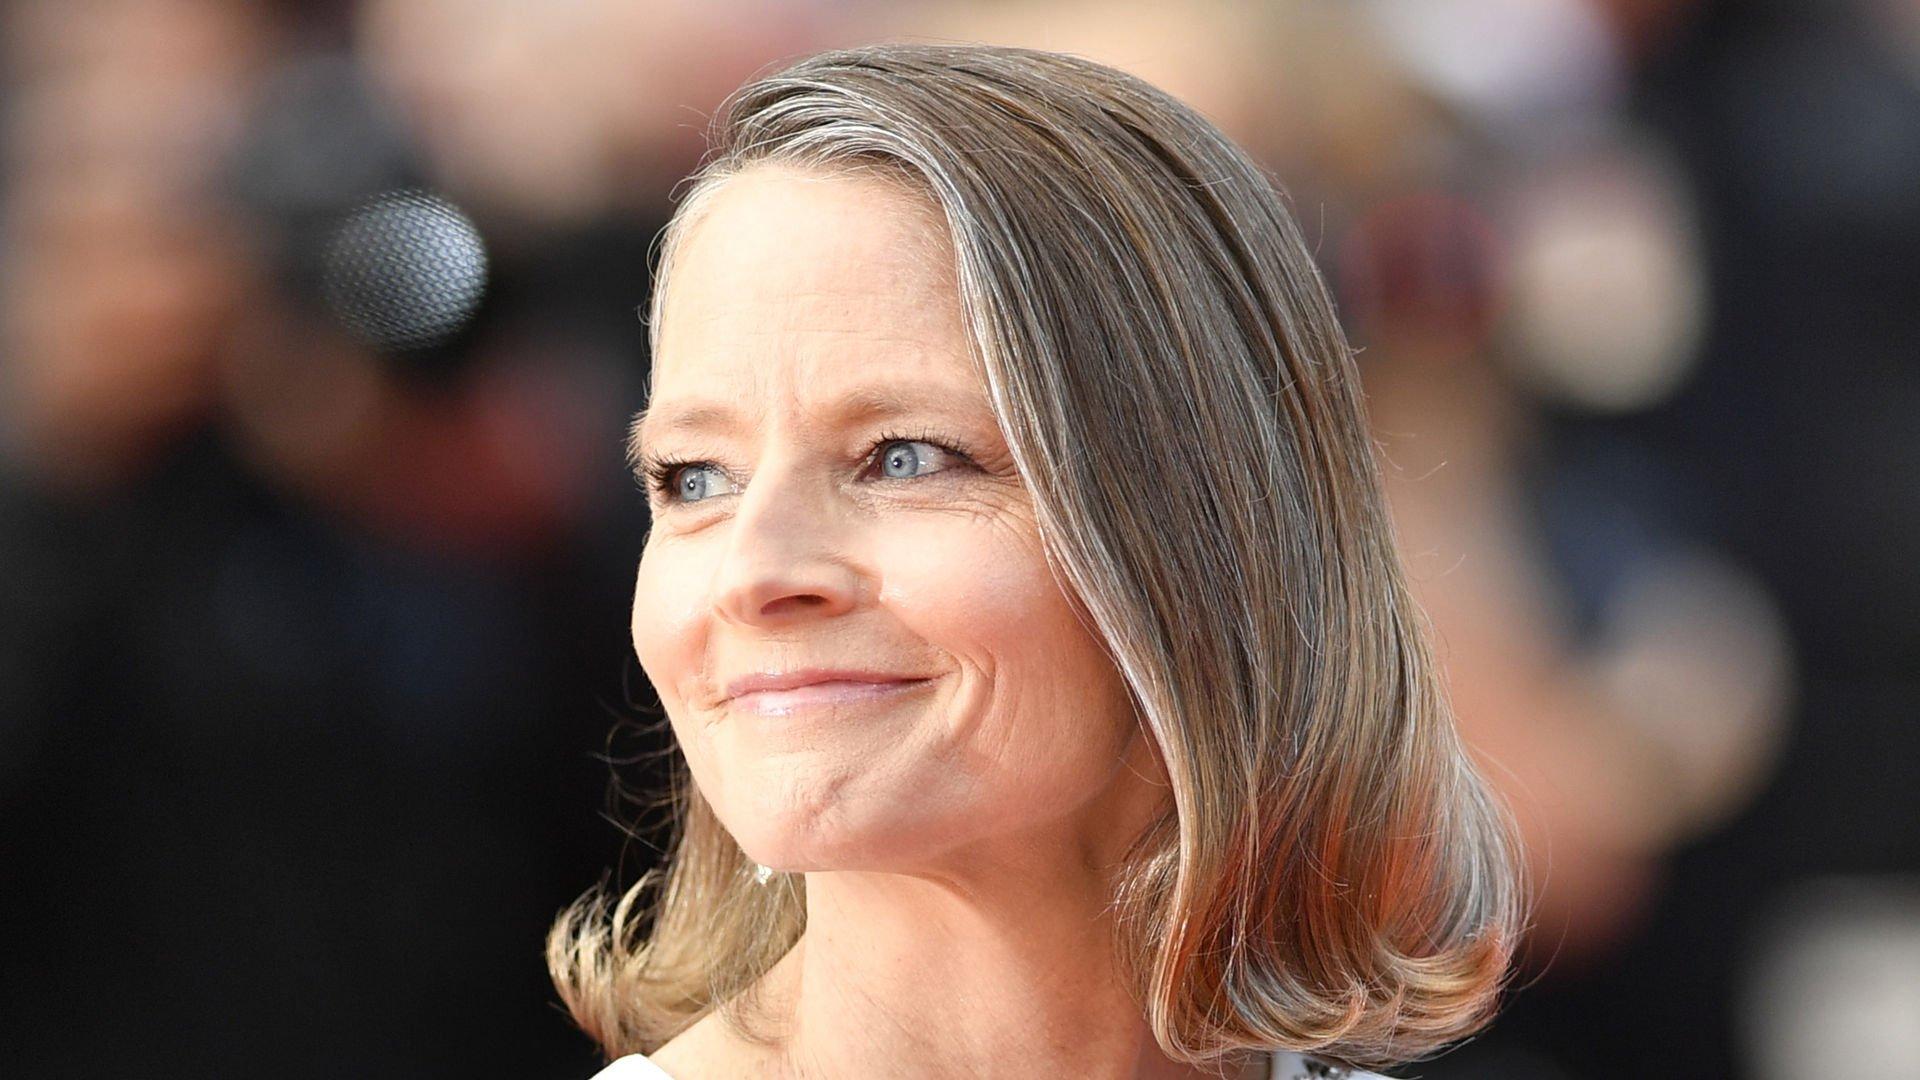 Jodie Foster Cannes Film Festivali'nin onur konuğu